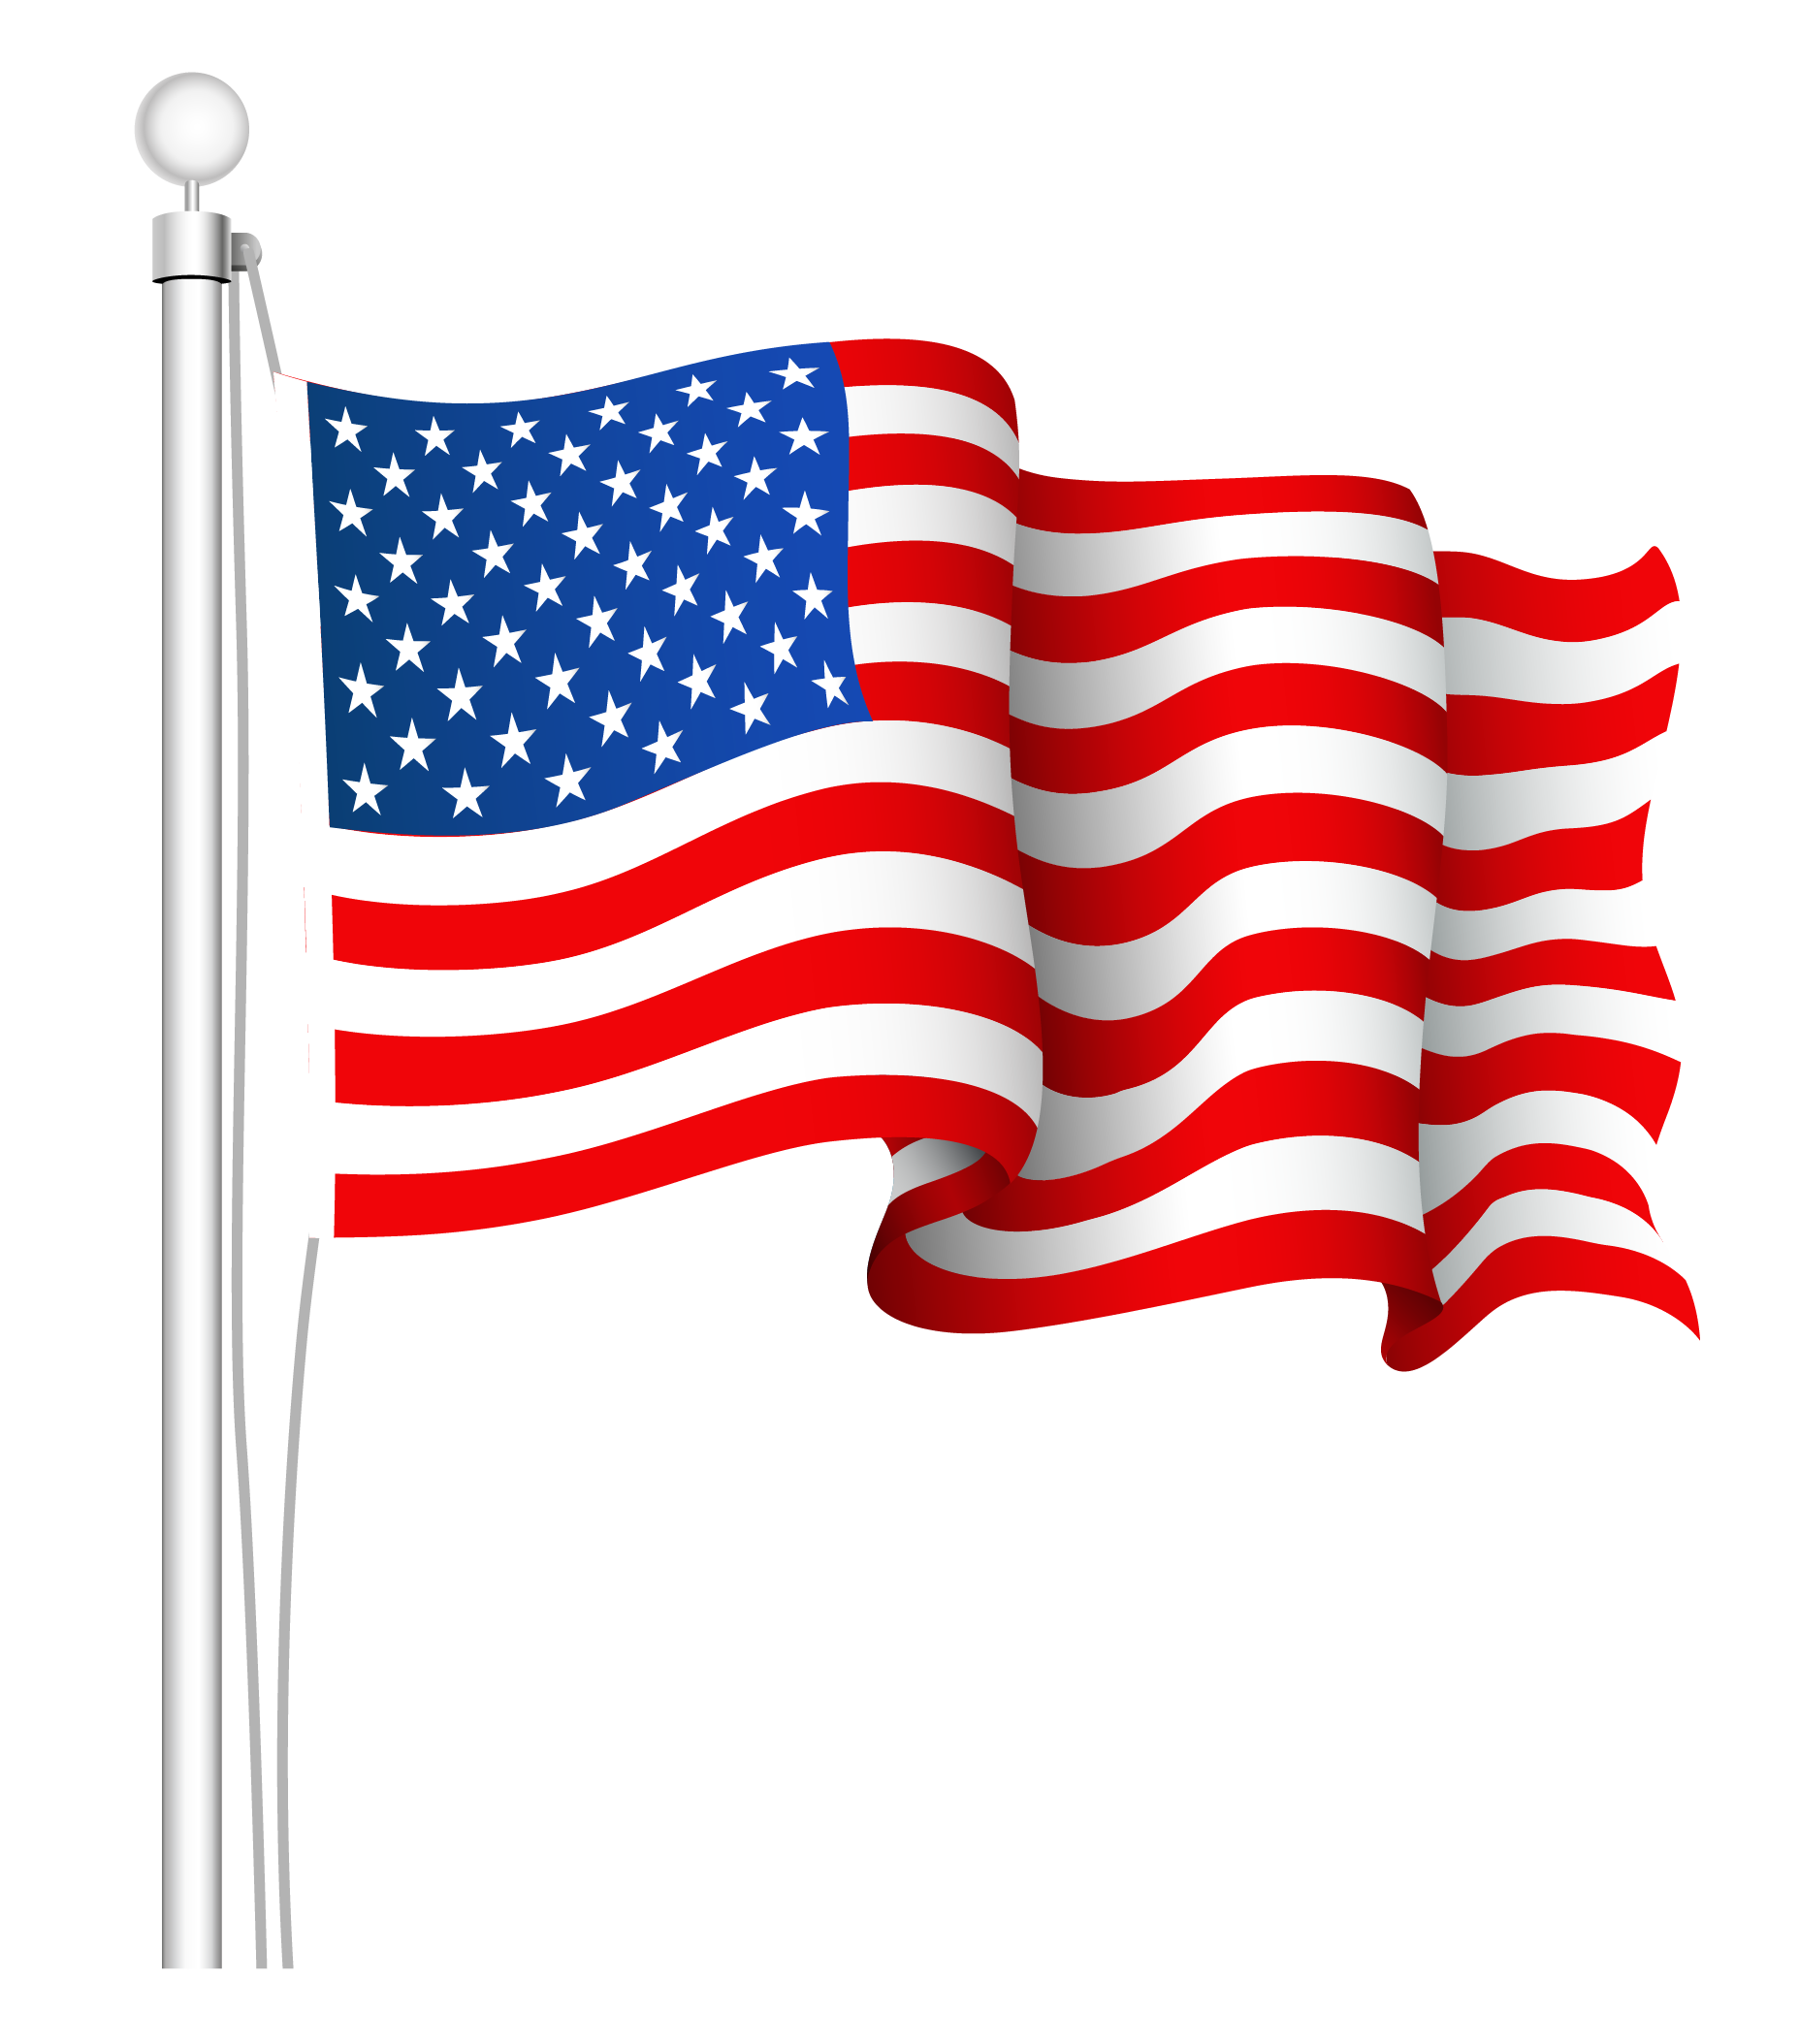 United States Flag Clip Art Cliparts Co-United States Flag Clip Art Cliparts Co-5